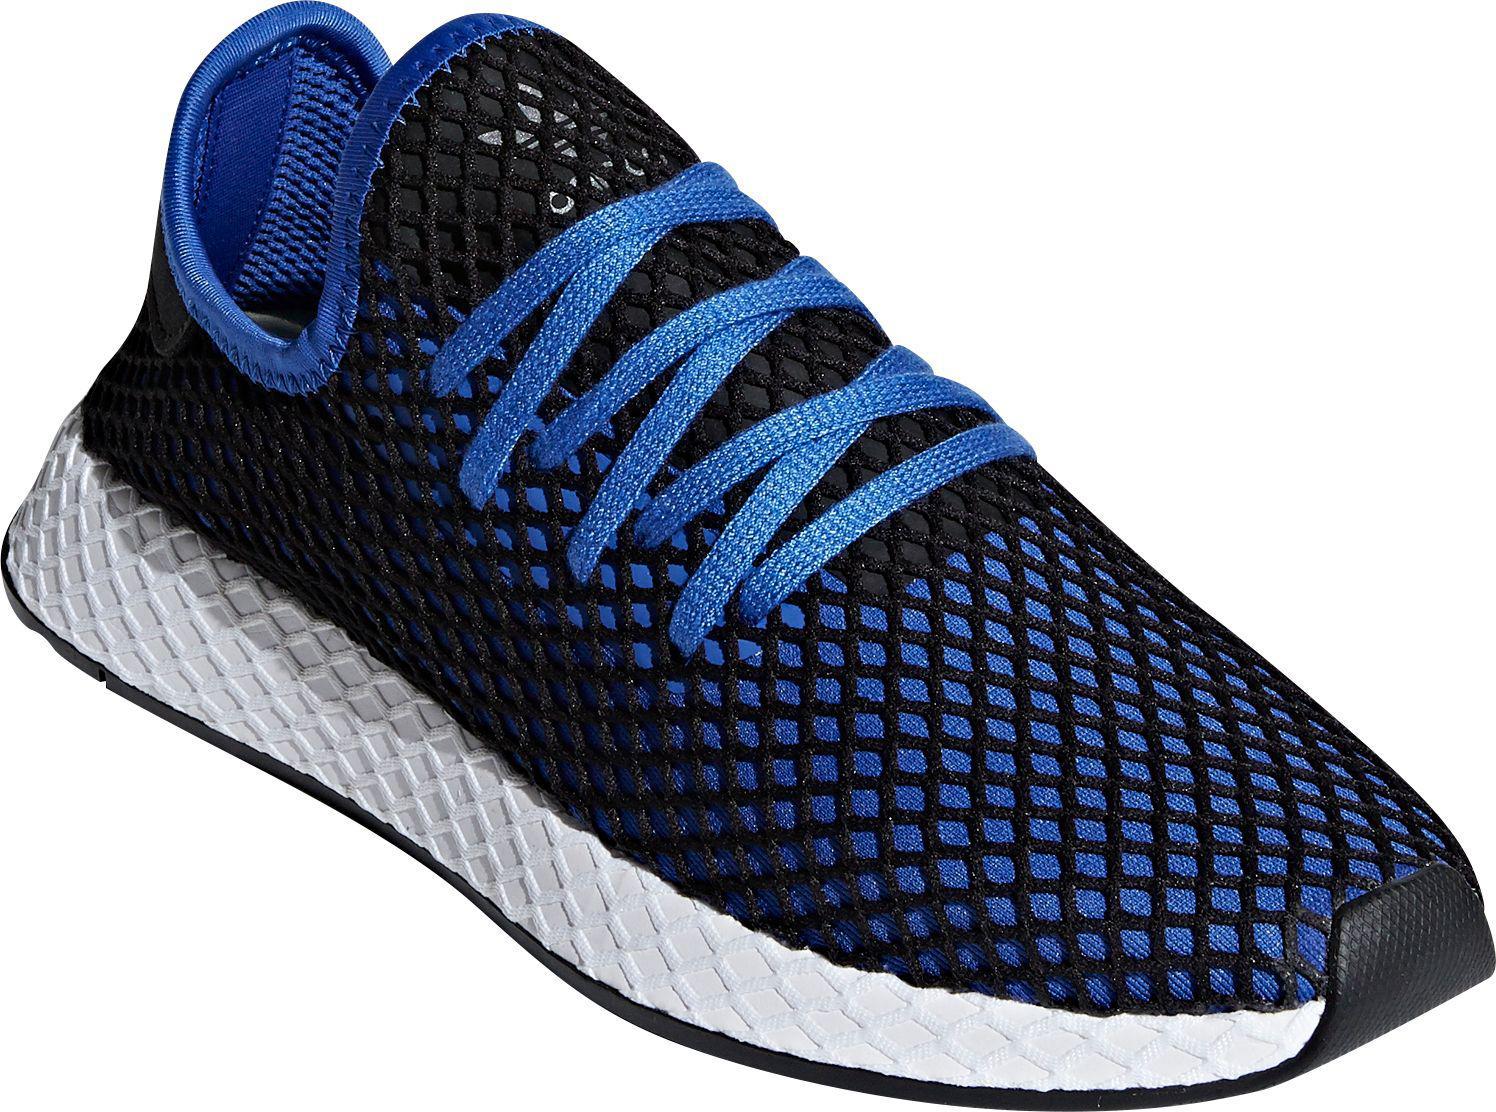 7bf9dc5fb3c23 Adidas - Multicolor Originals Deerupt Runner Shoes for Men - Lyst